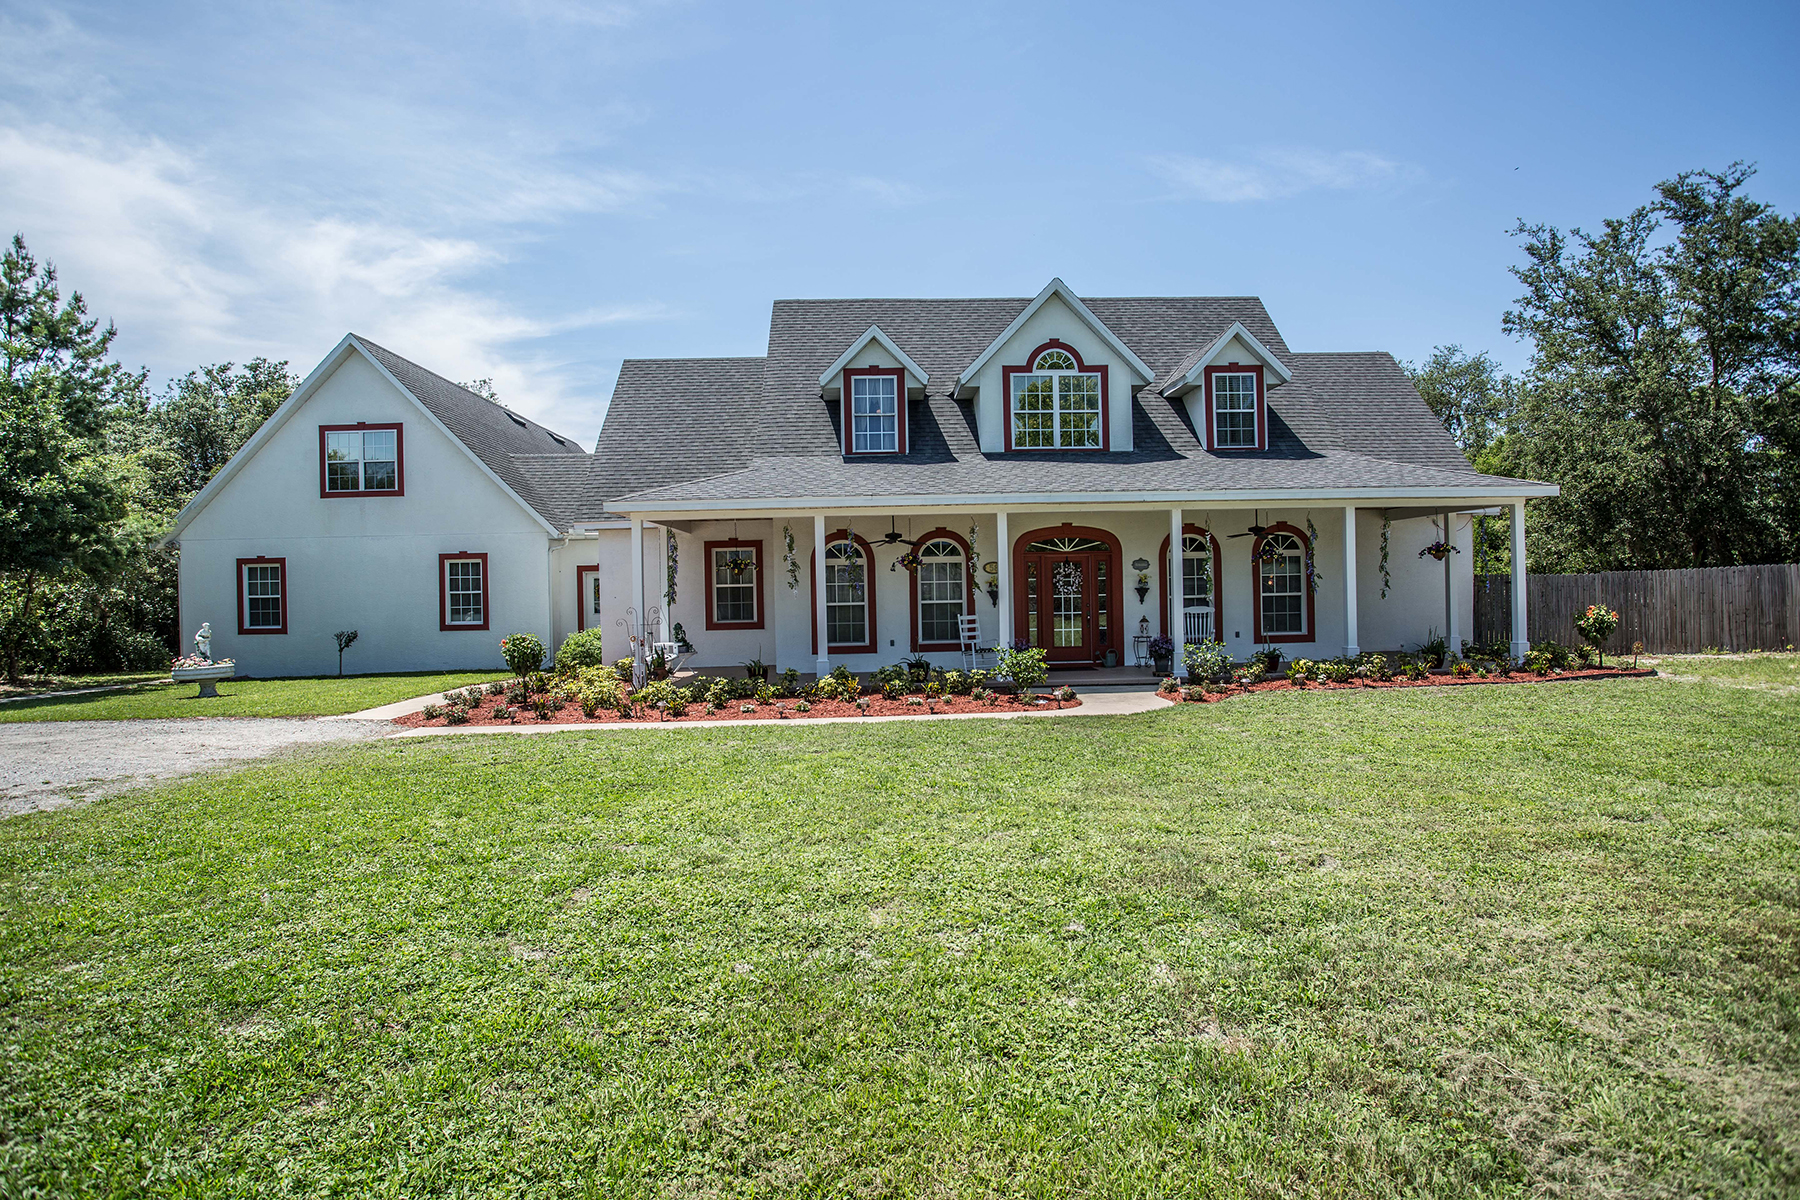 Casa Unifamiliar por un Venta en DELTONA,FLORIDA 58 S Courtland Blvd E Deltona, Florida 32738 Estados Unidos